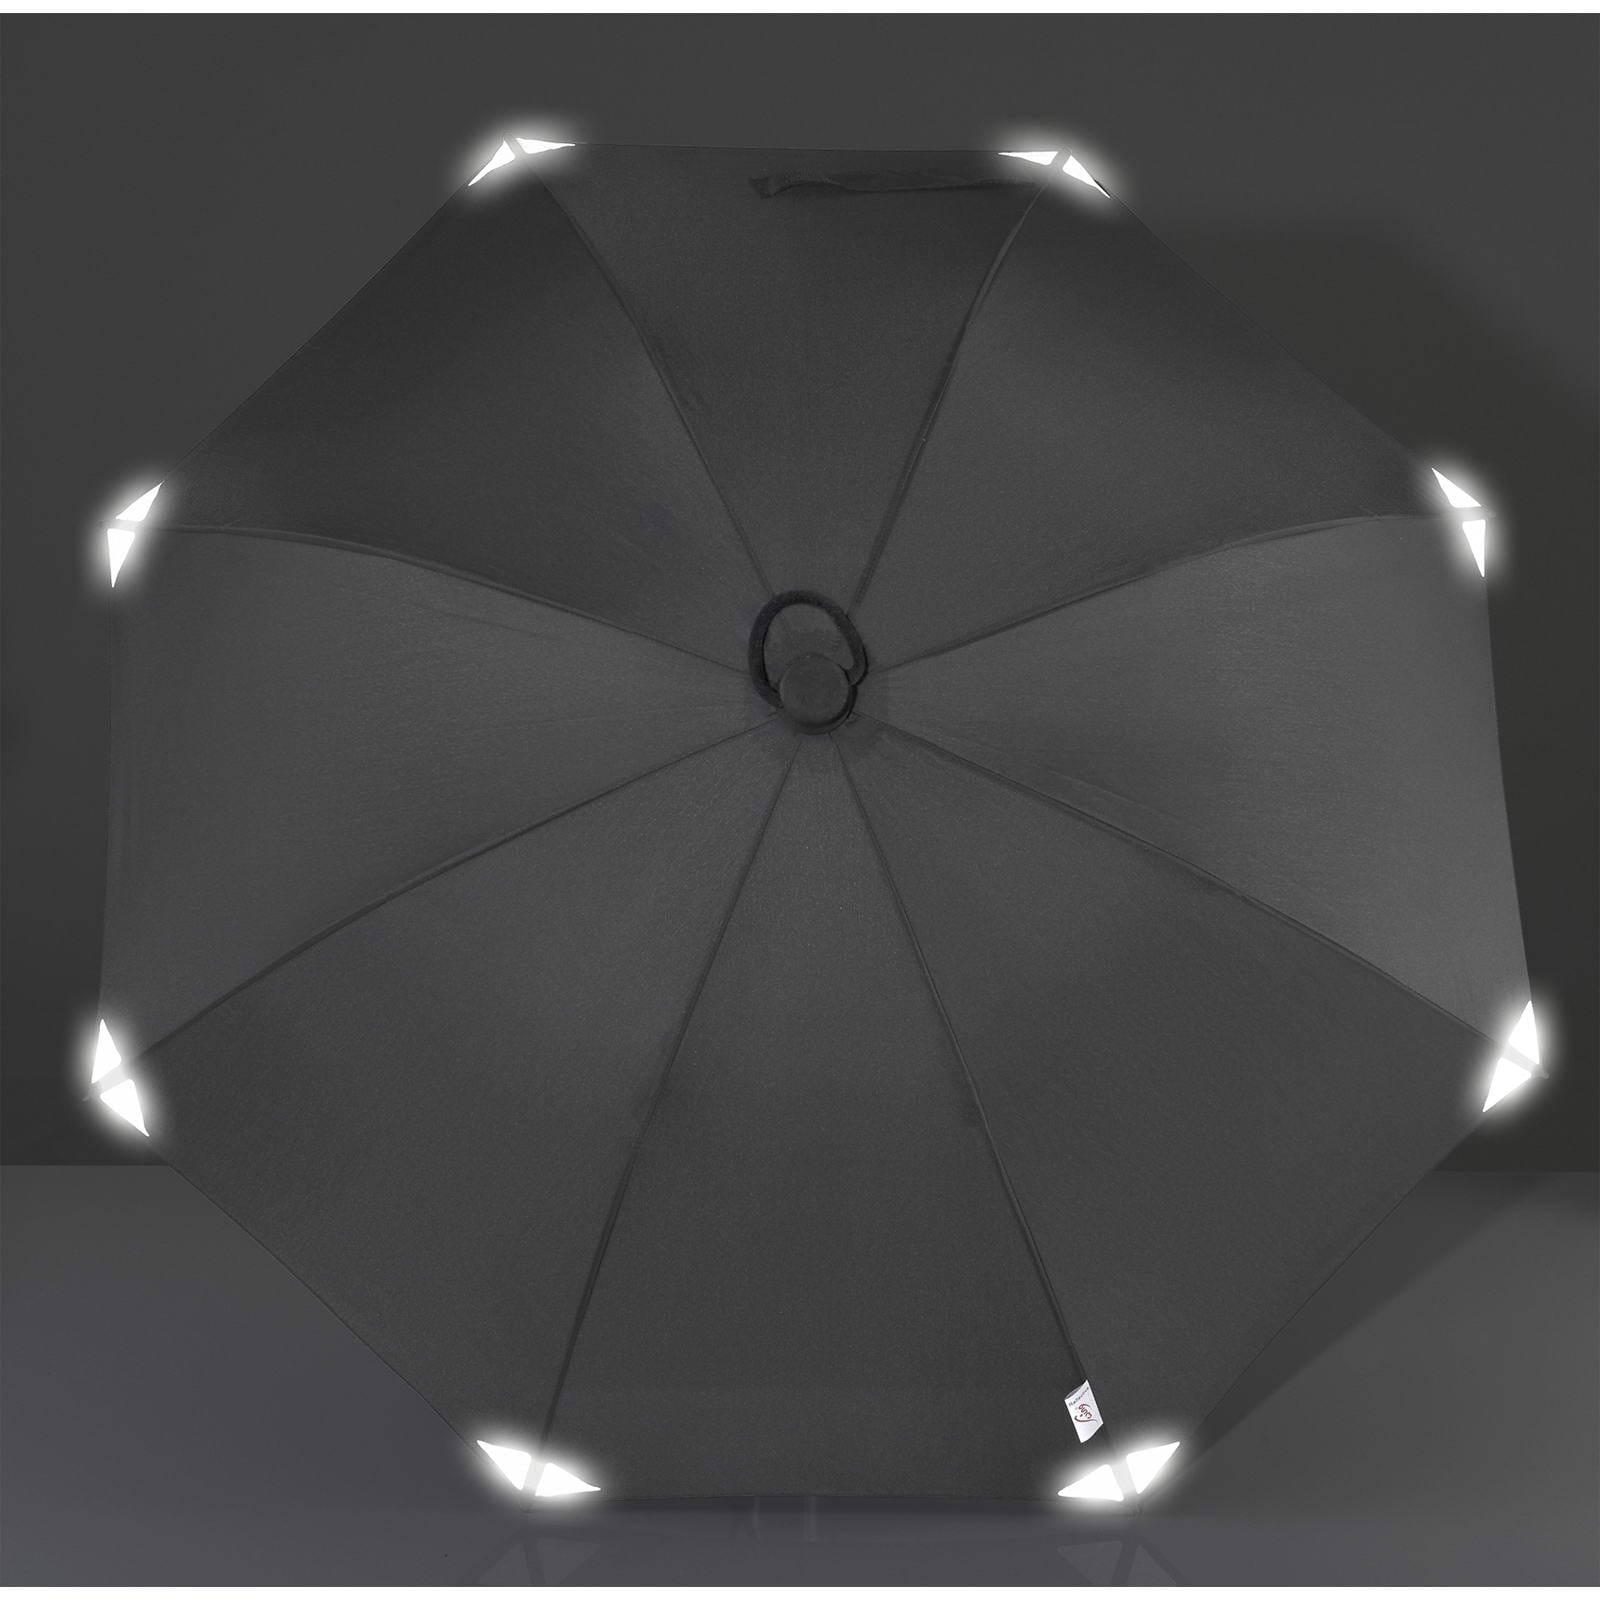 EuroSchirm Swing liteflex - Regenschirm reflective - Bild 6